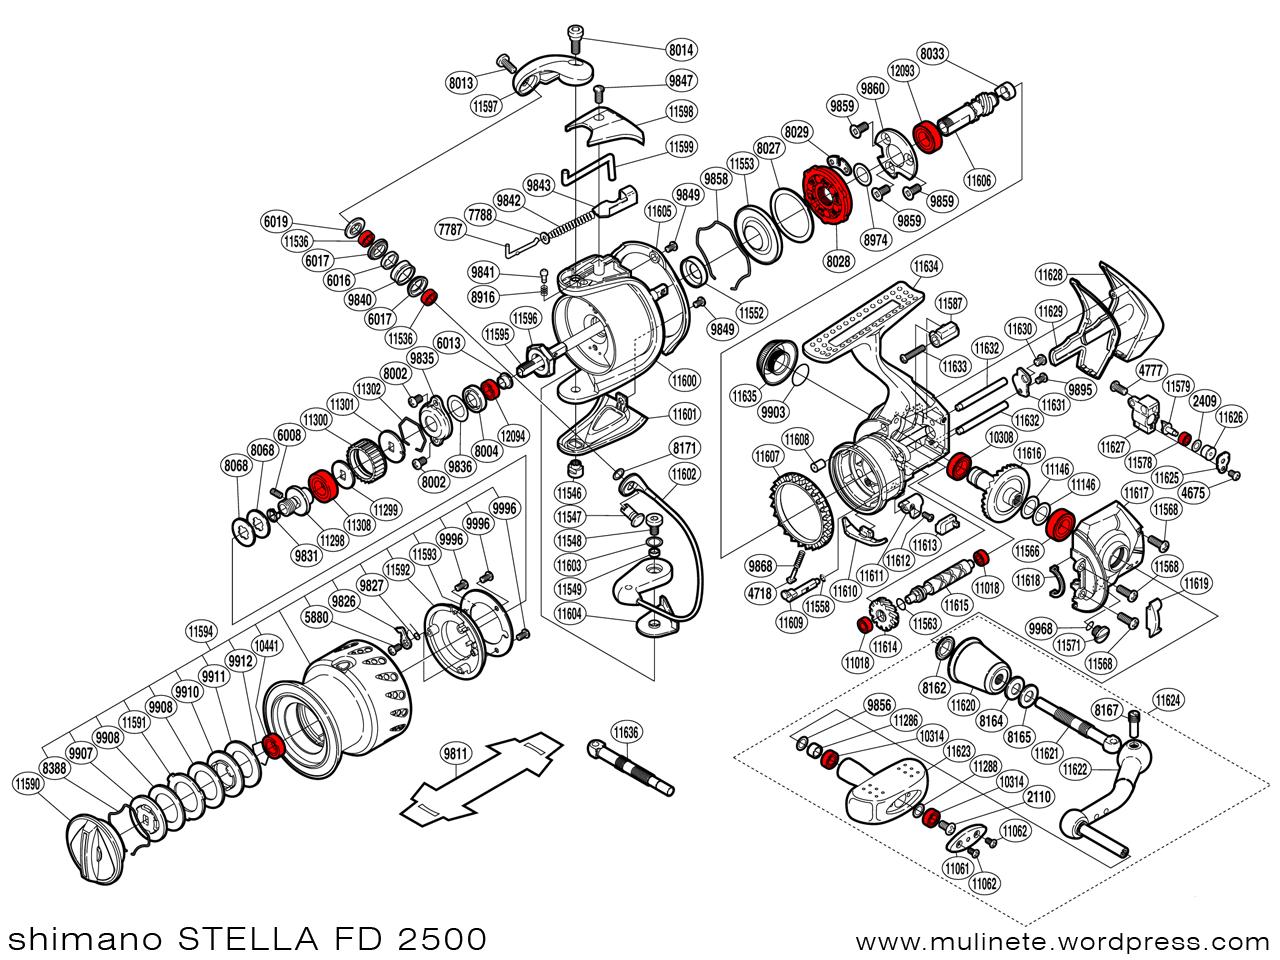 Shimano Stella Fd